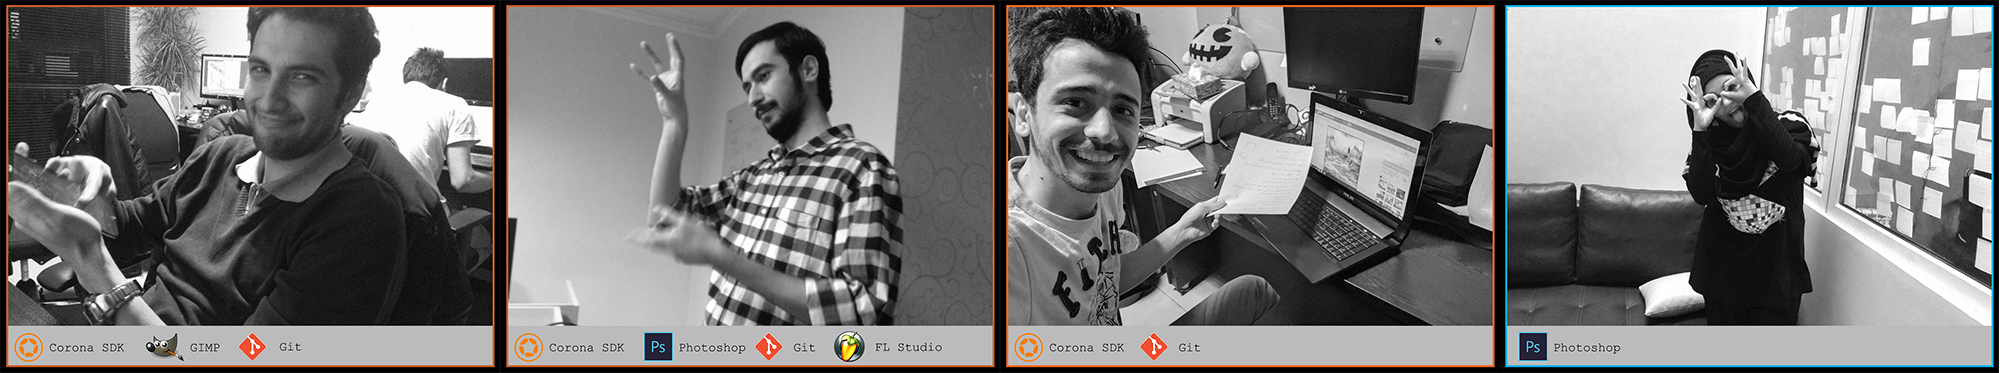 تیم توسعه پلاسکو